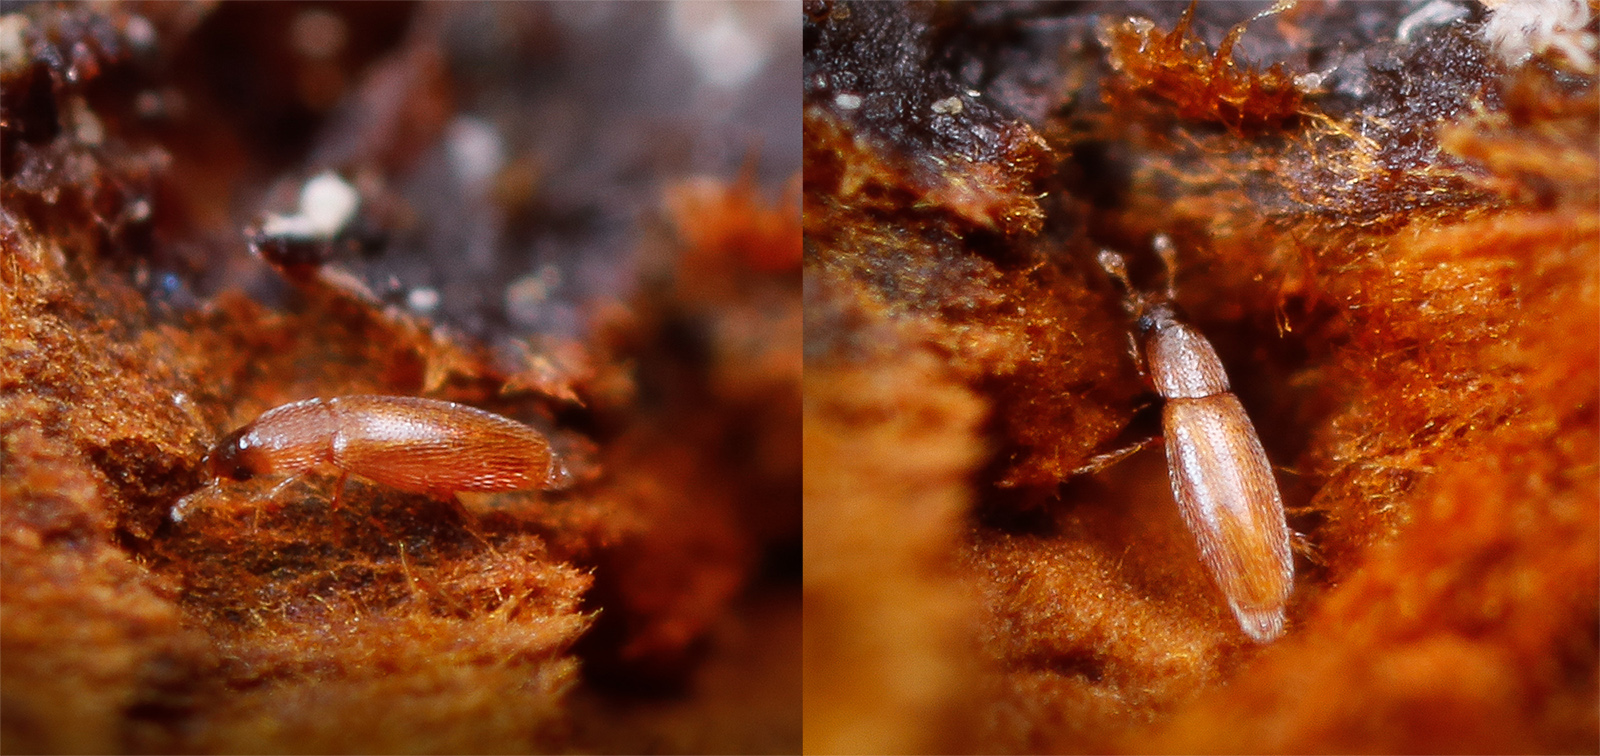 Baranowskiella ehnstromi, fjädervinge